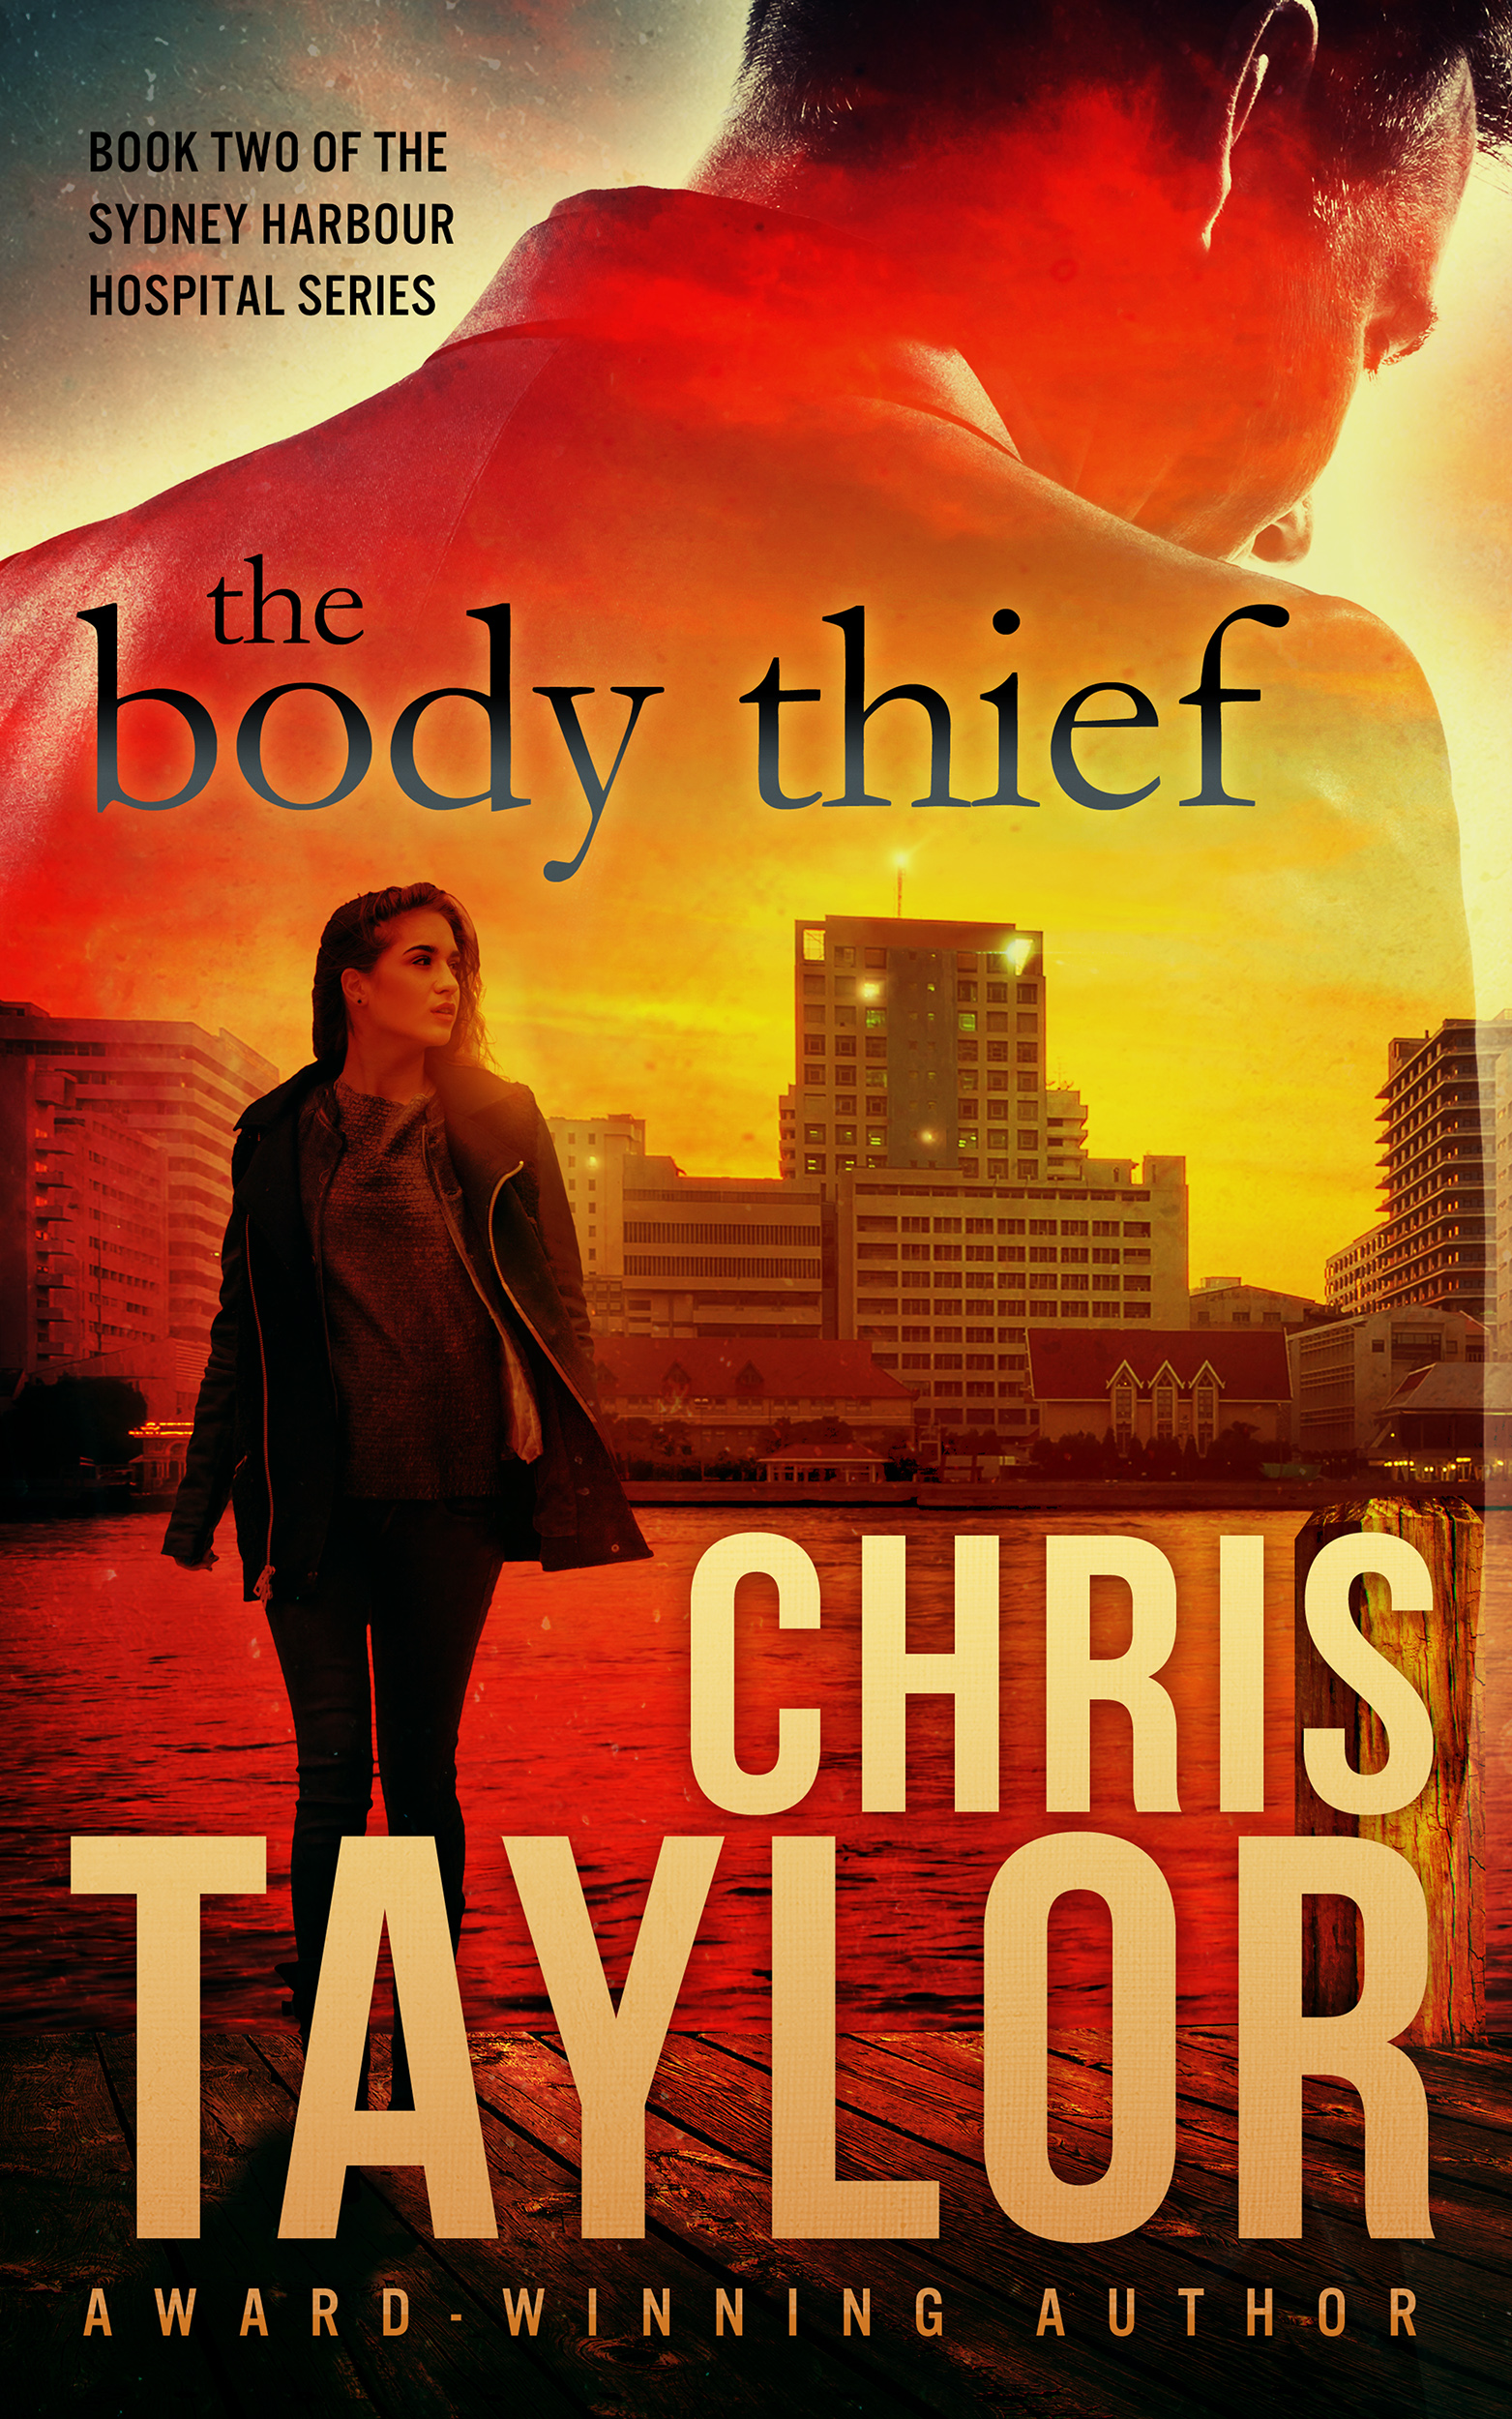 The Body Thief